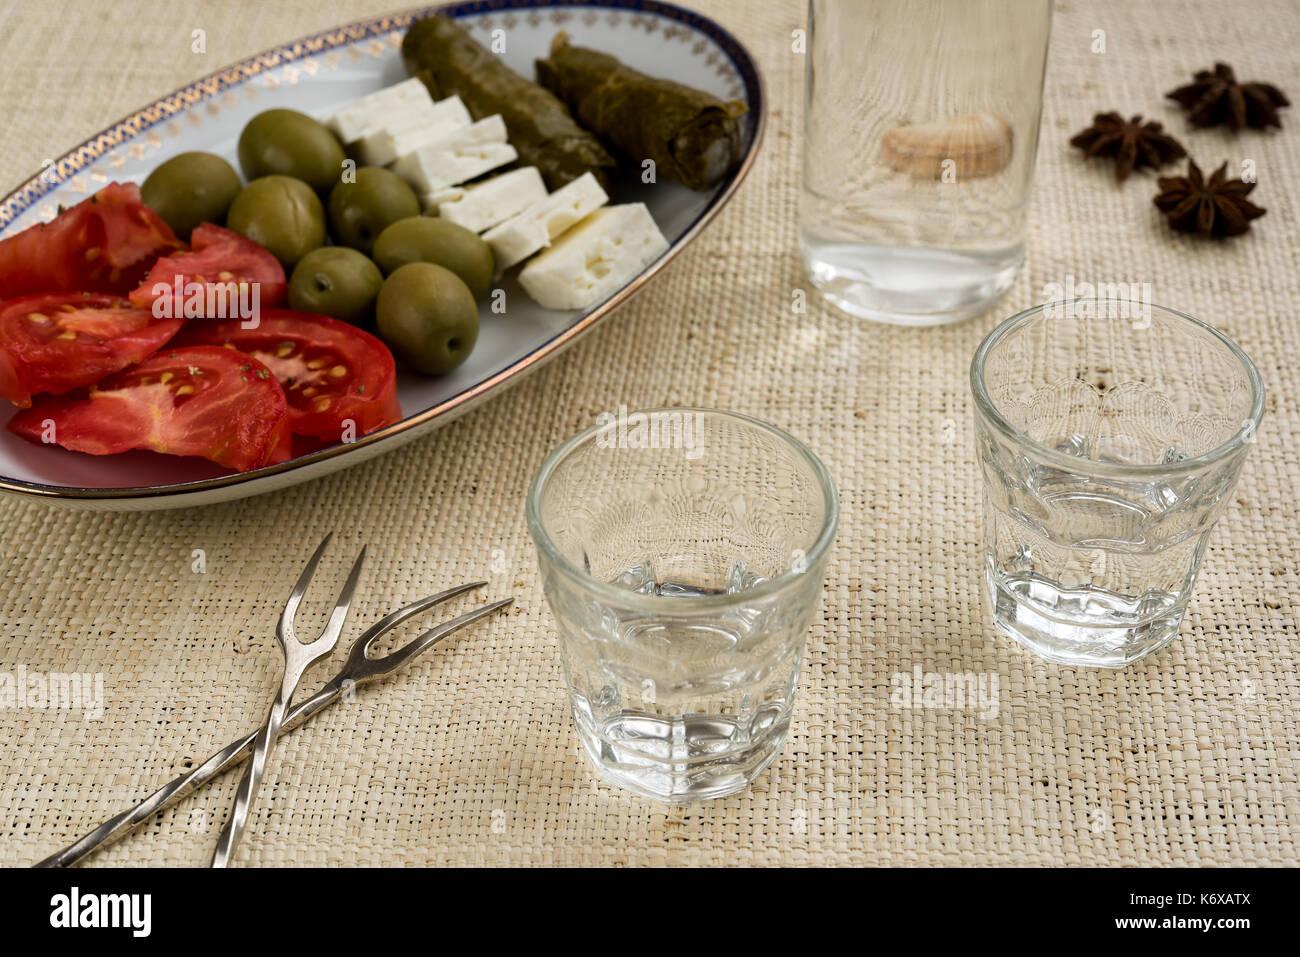 how to drink greek raki